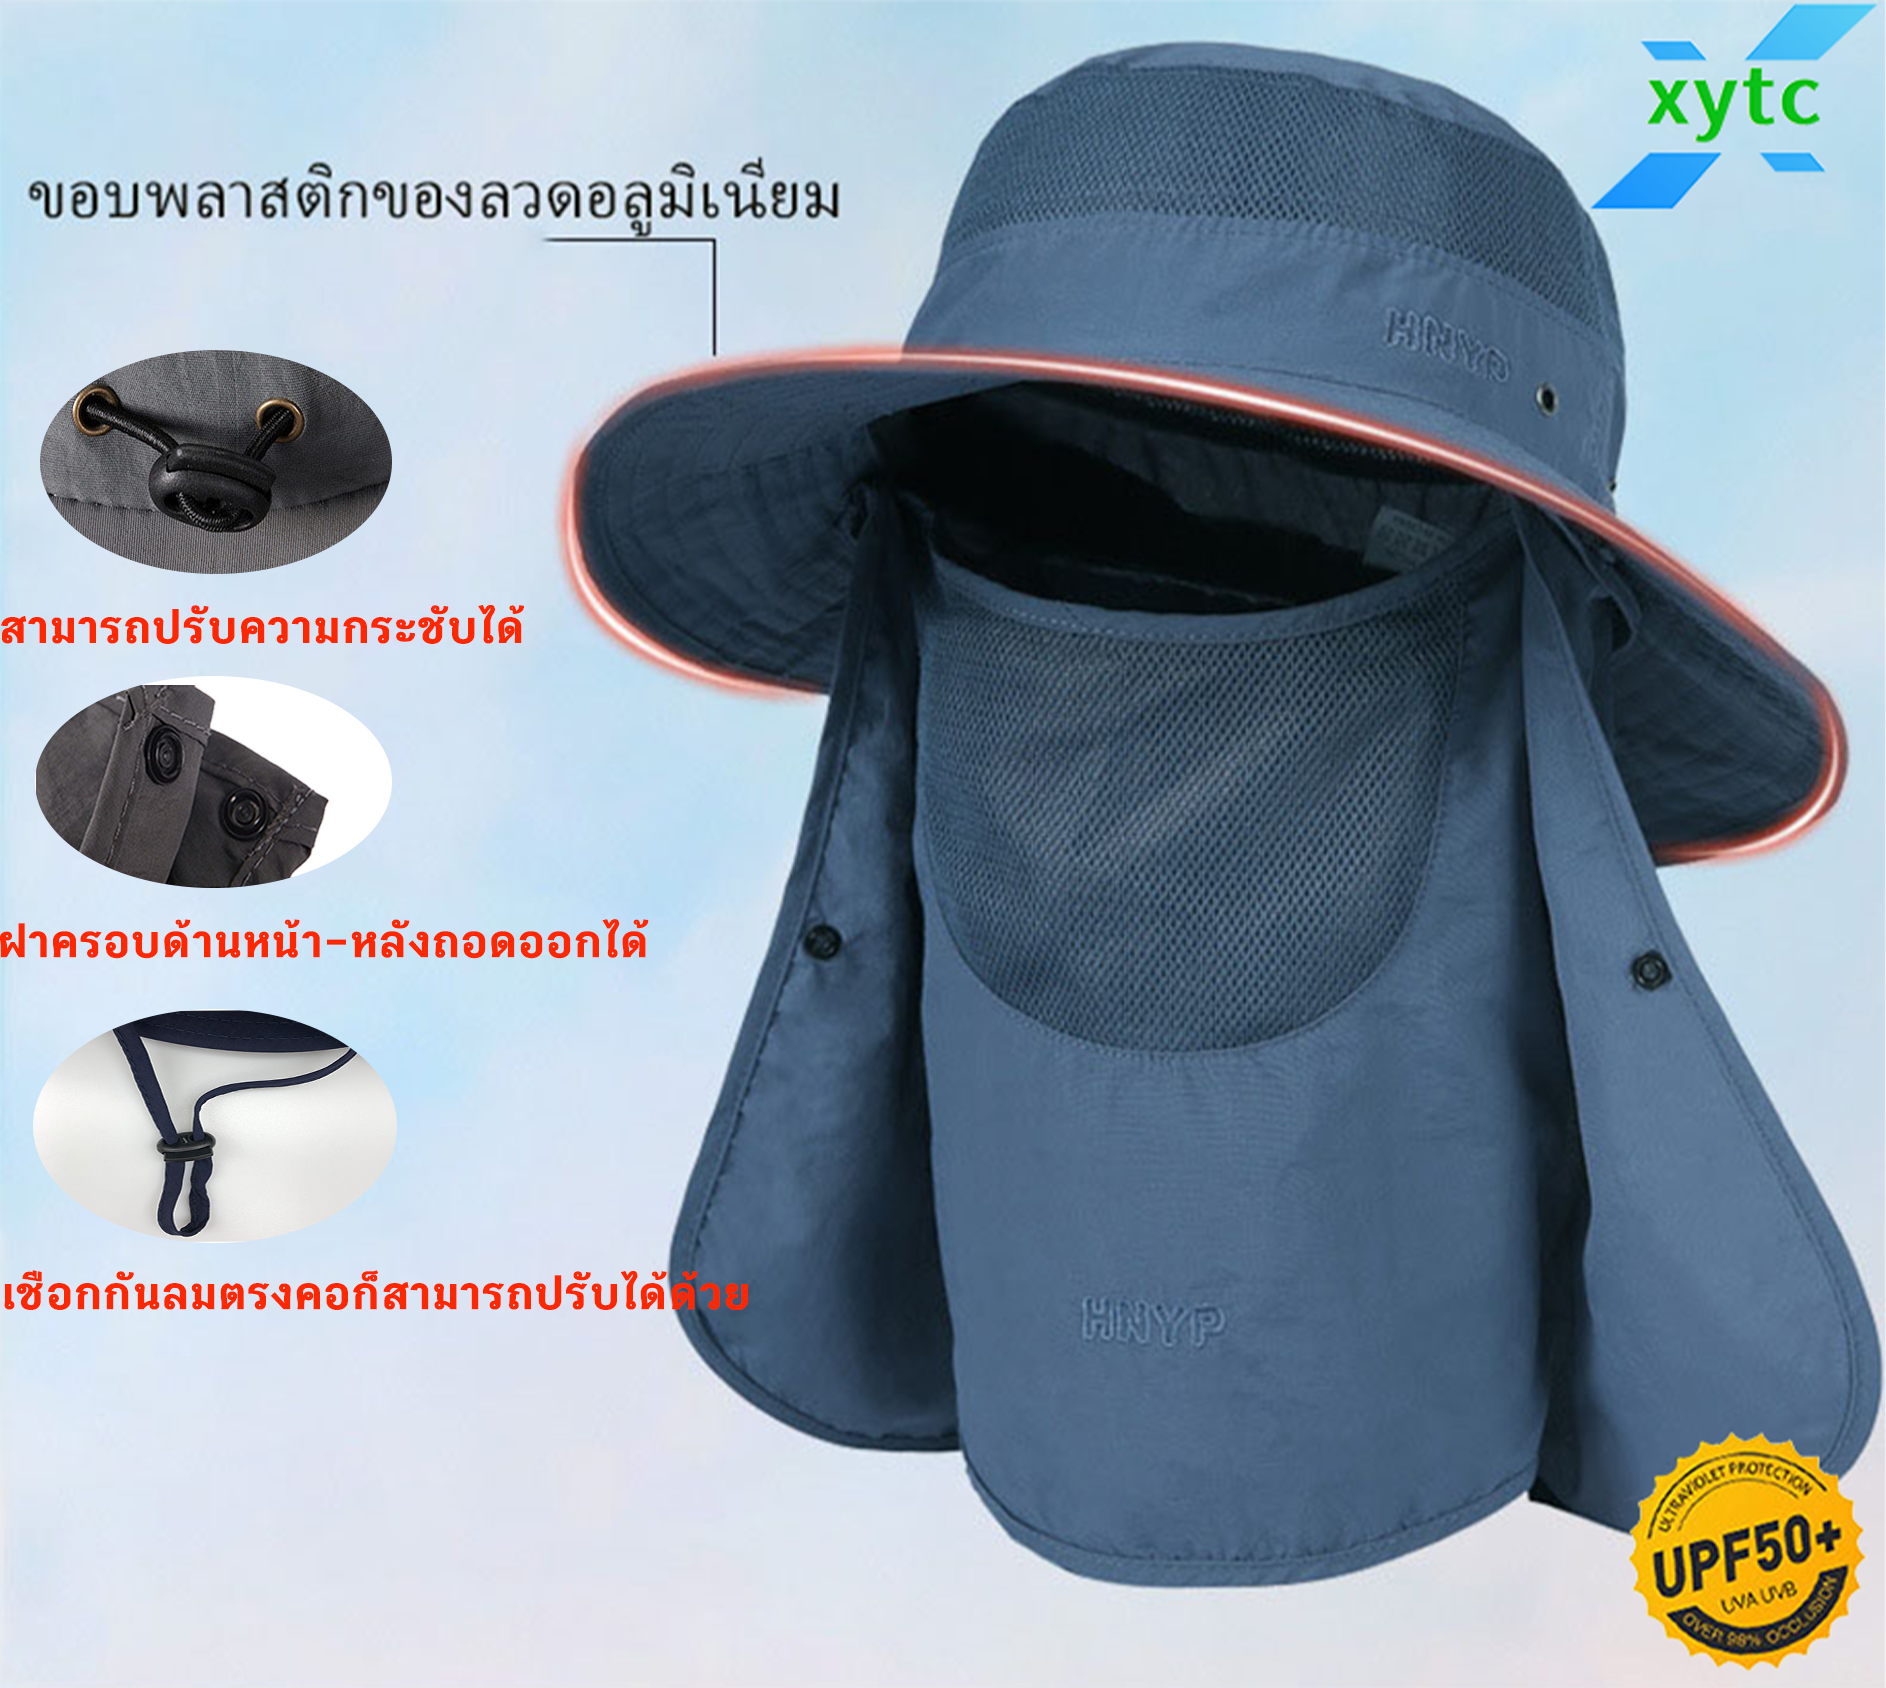 Xytc หมวกกันแดดฉนวนกันความร้อน 360 องศาหมวกทรงบักเก็ตกันแดดกัน Uv Z-012.